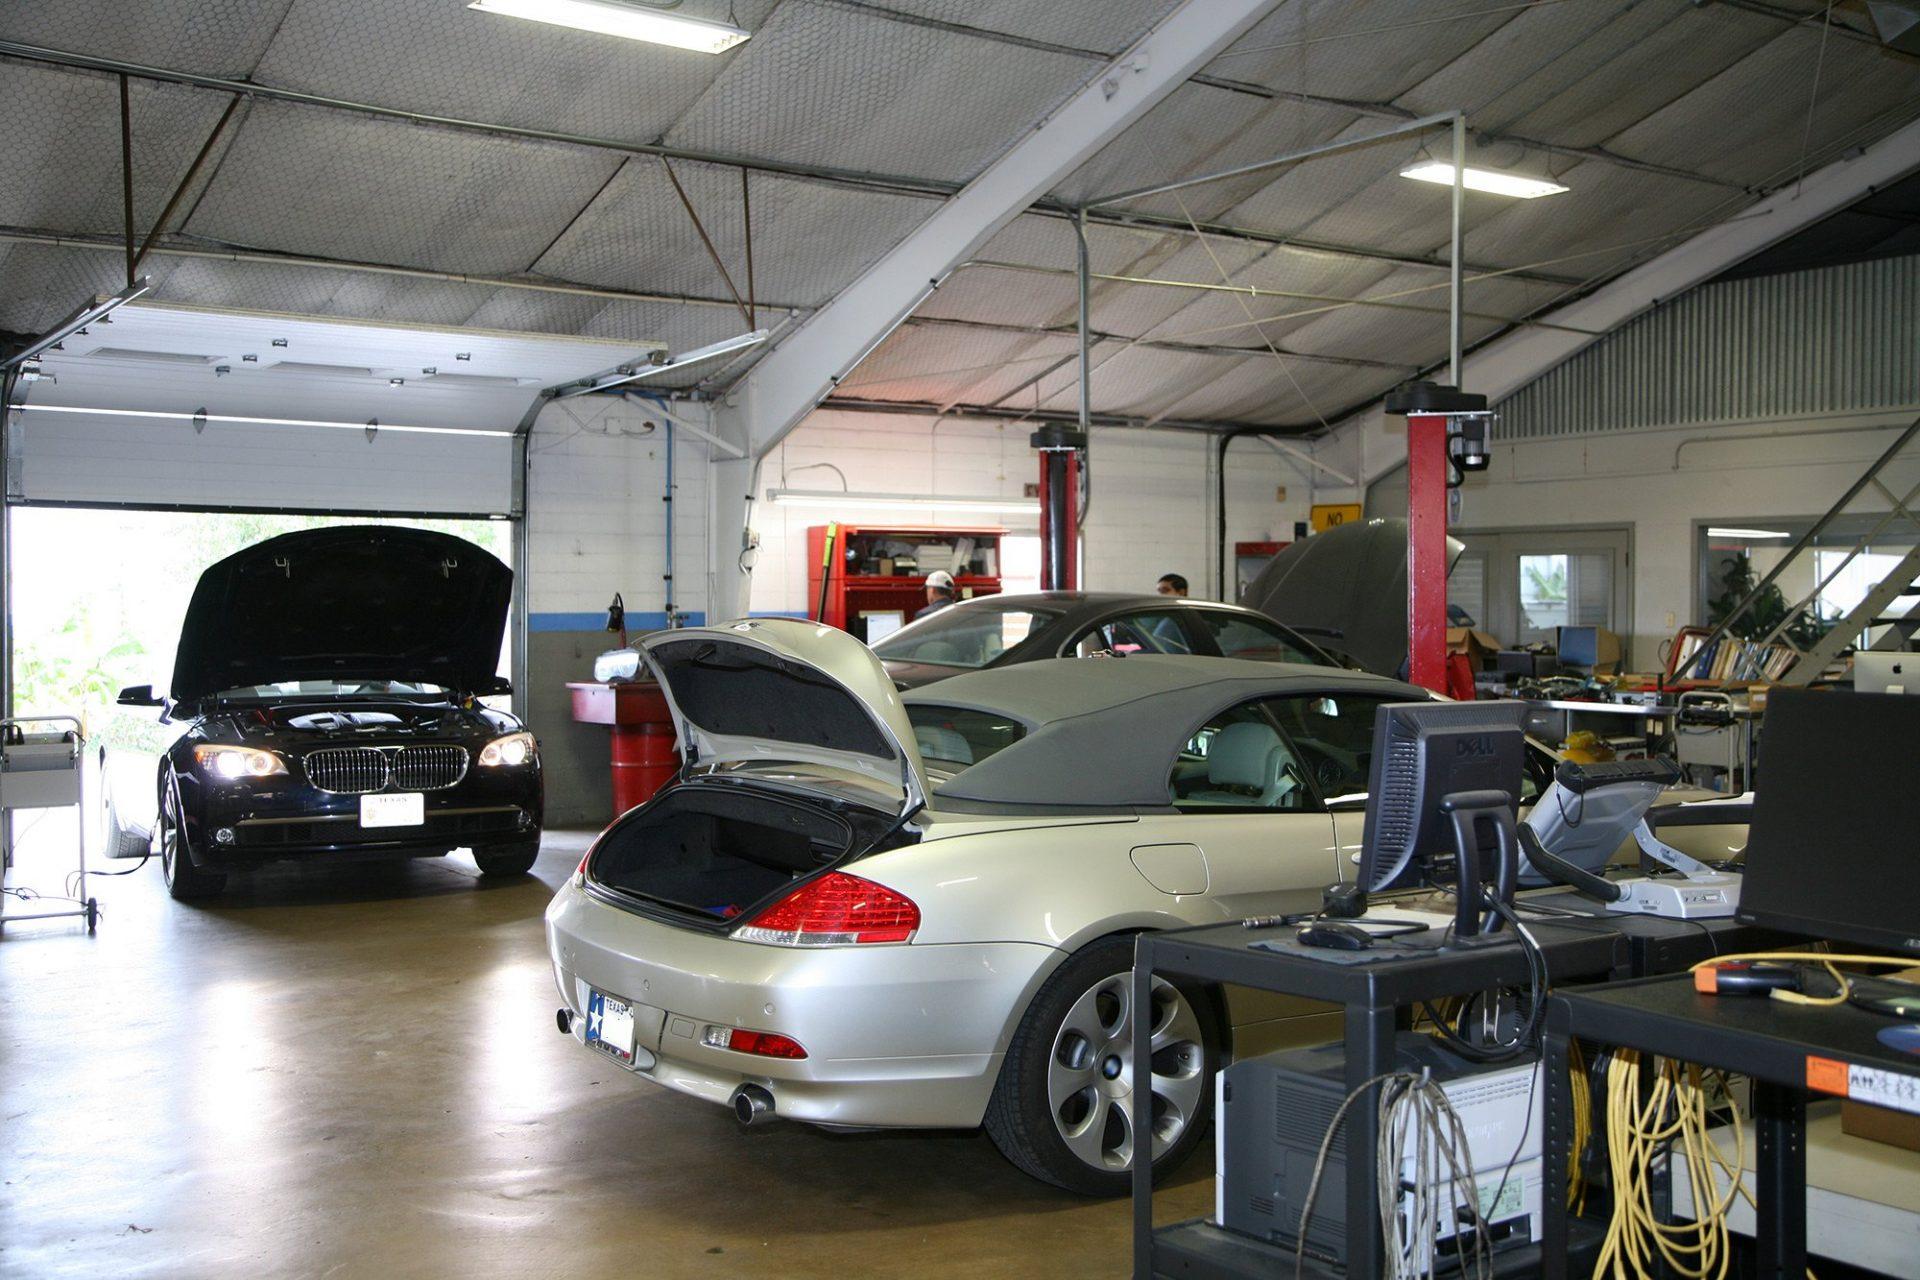 6-series BMW Maintenance